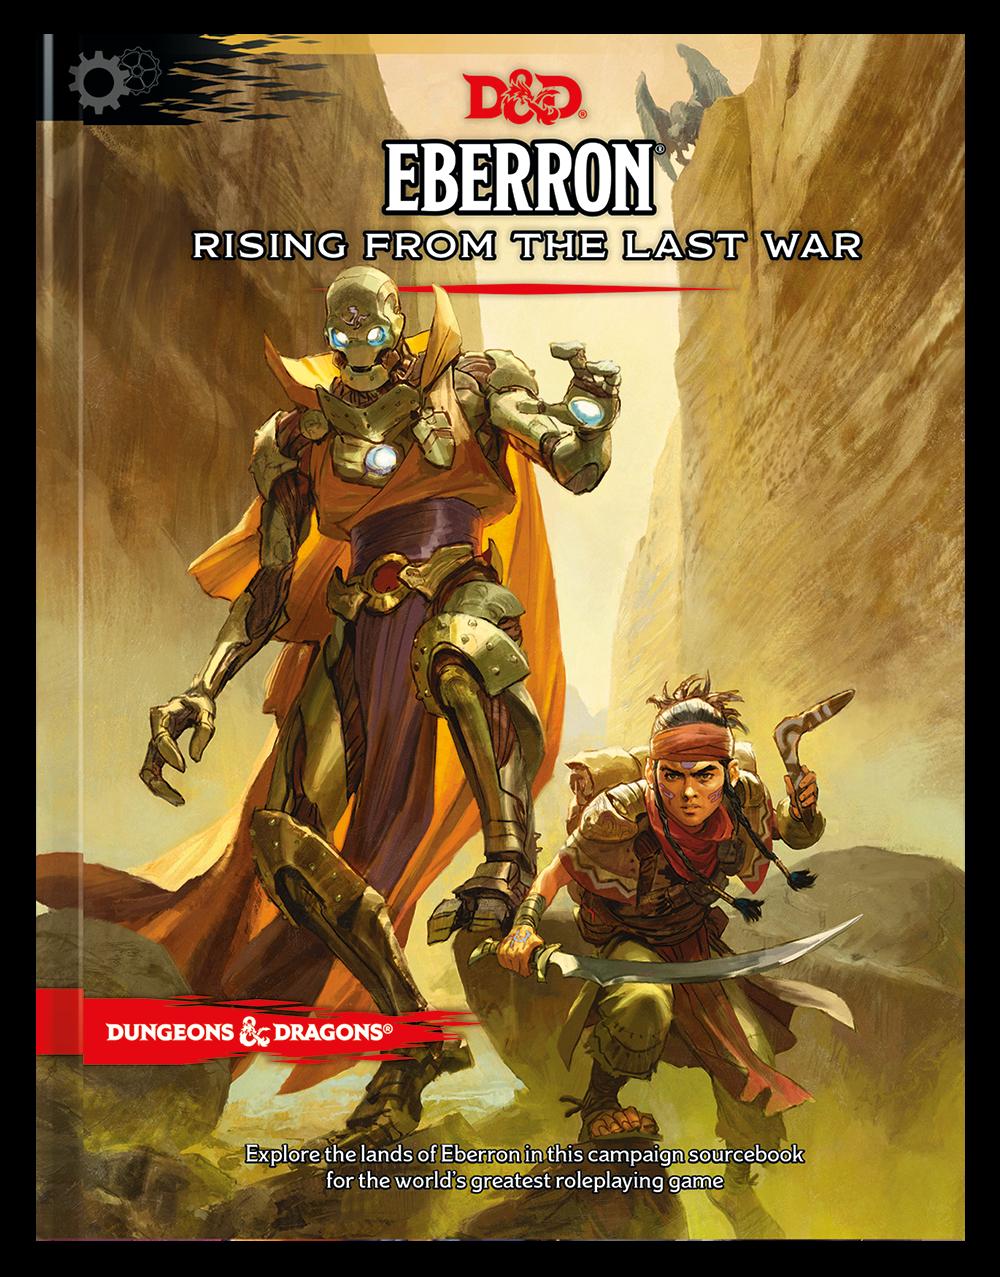 DND_Eberron_cover.png